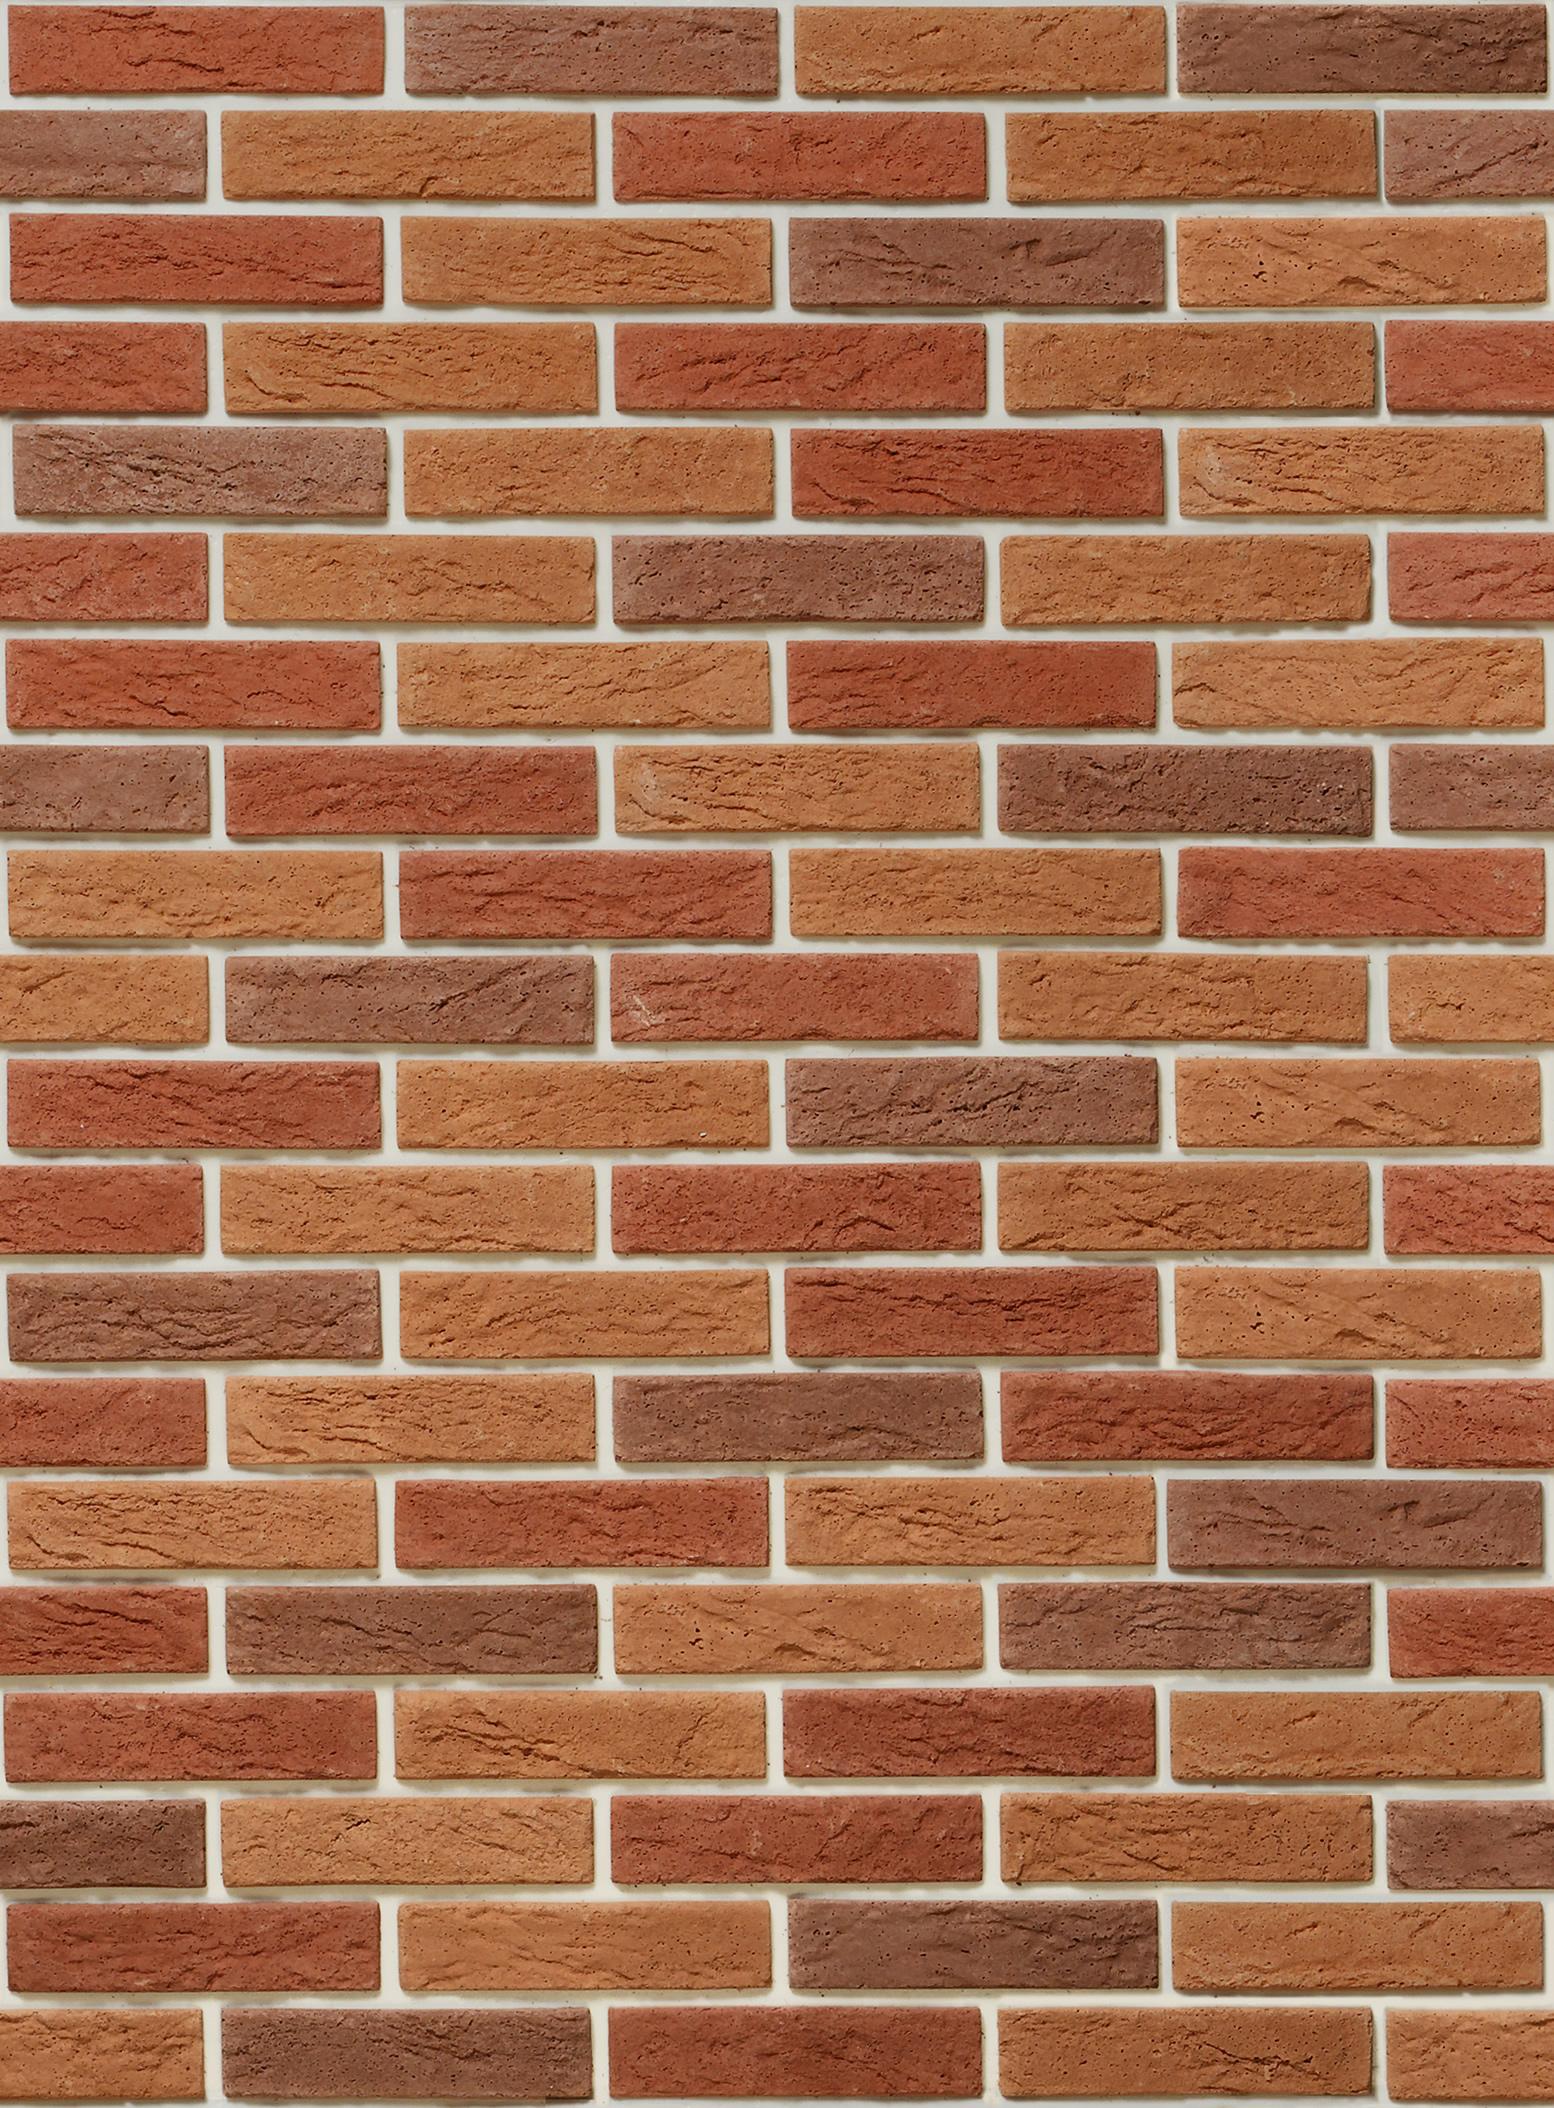 bricks, background, texture, download photo, brick wall texture